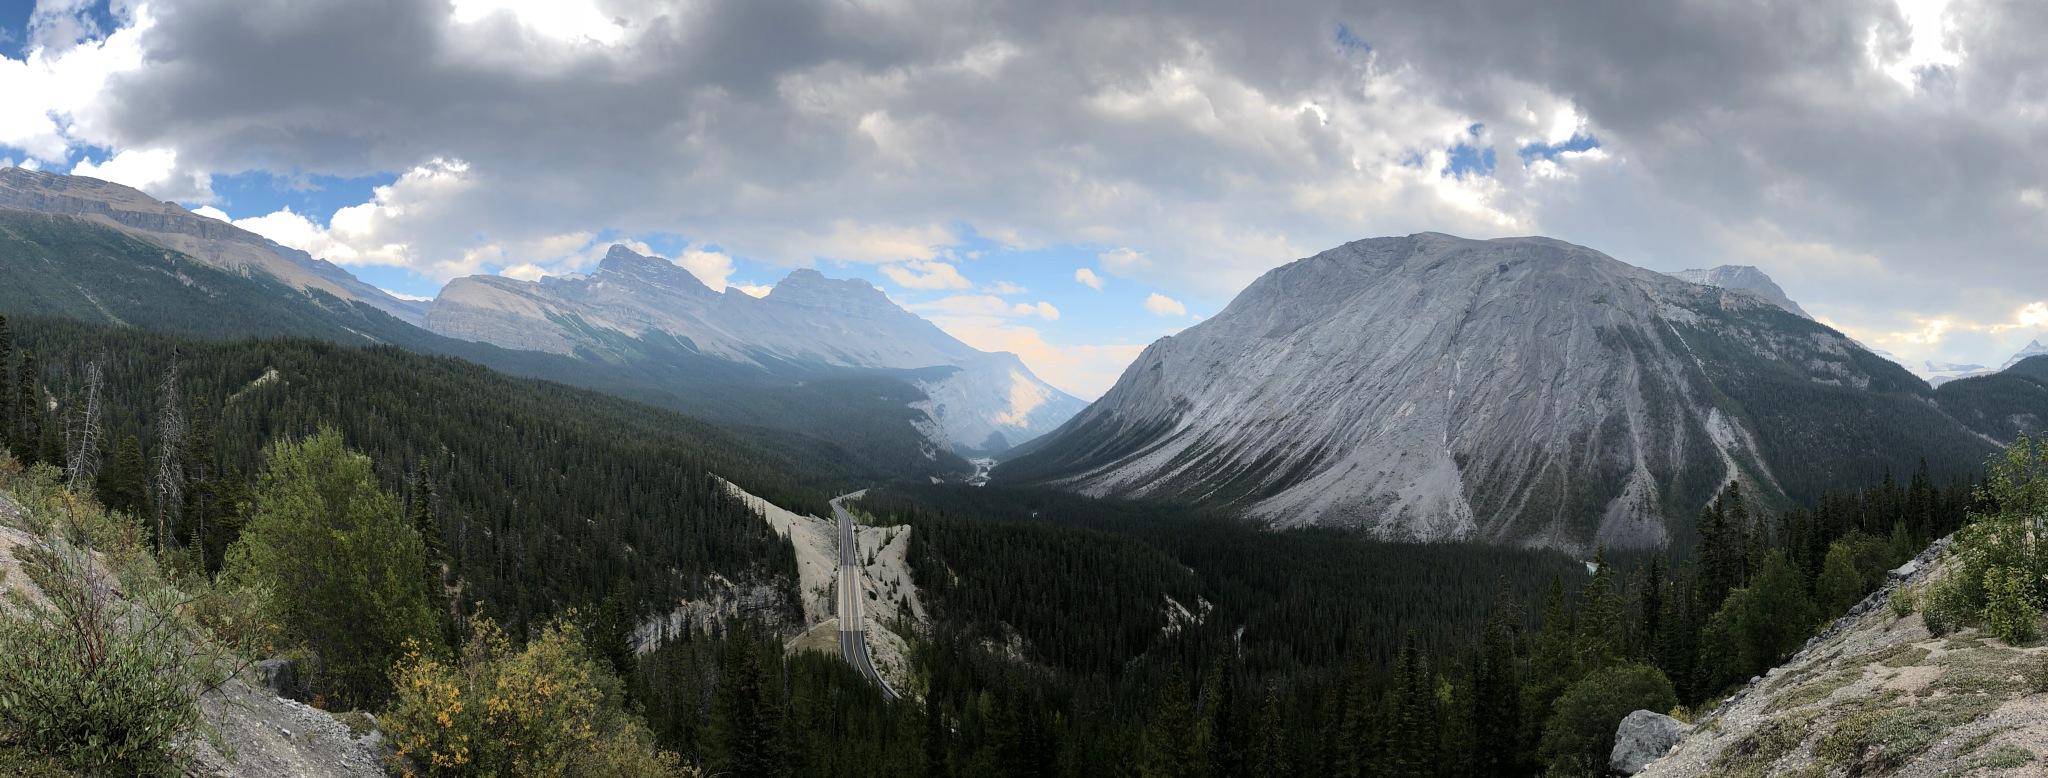 Mountain Views  by Paul Pashulka